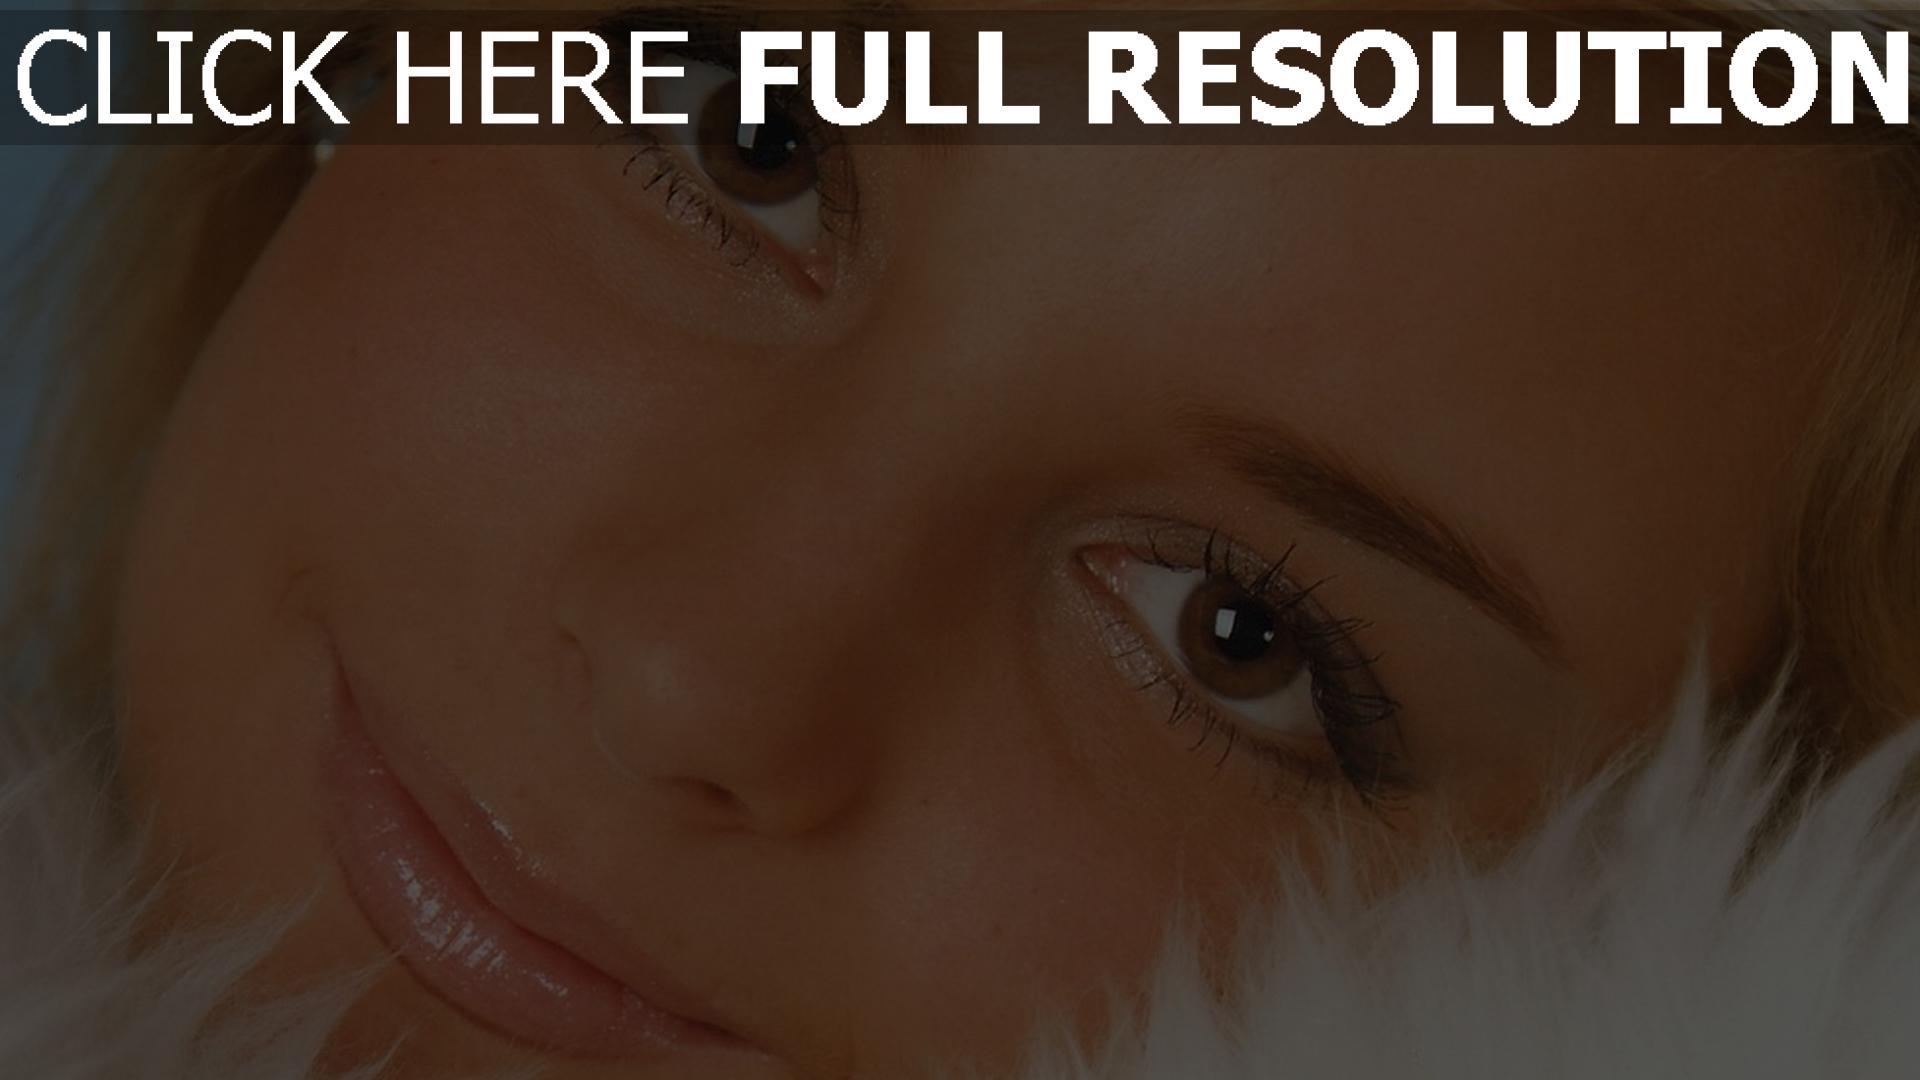 fond d'écran 1920x1080 visage yeux bruns gros plan mascara